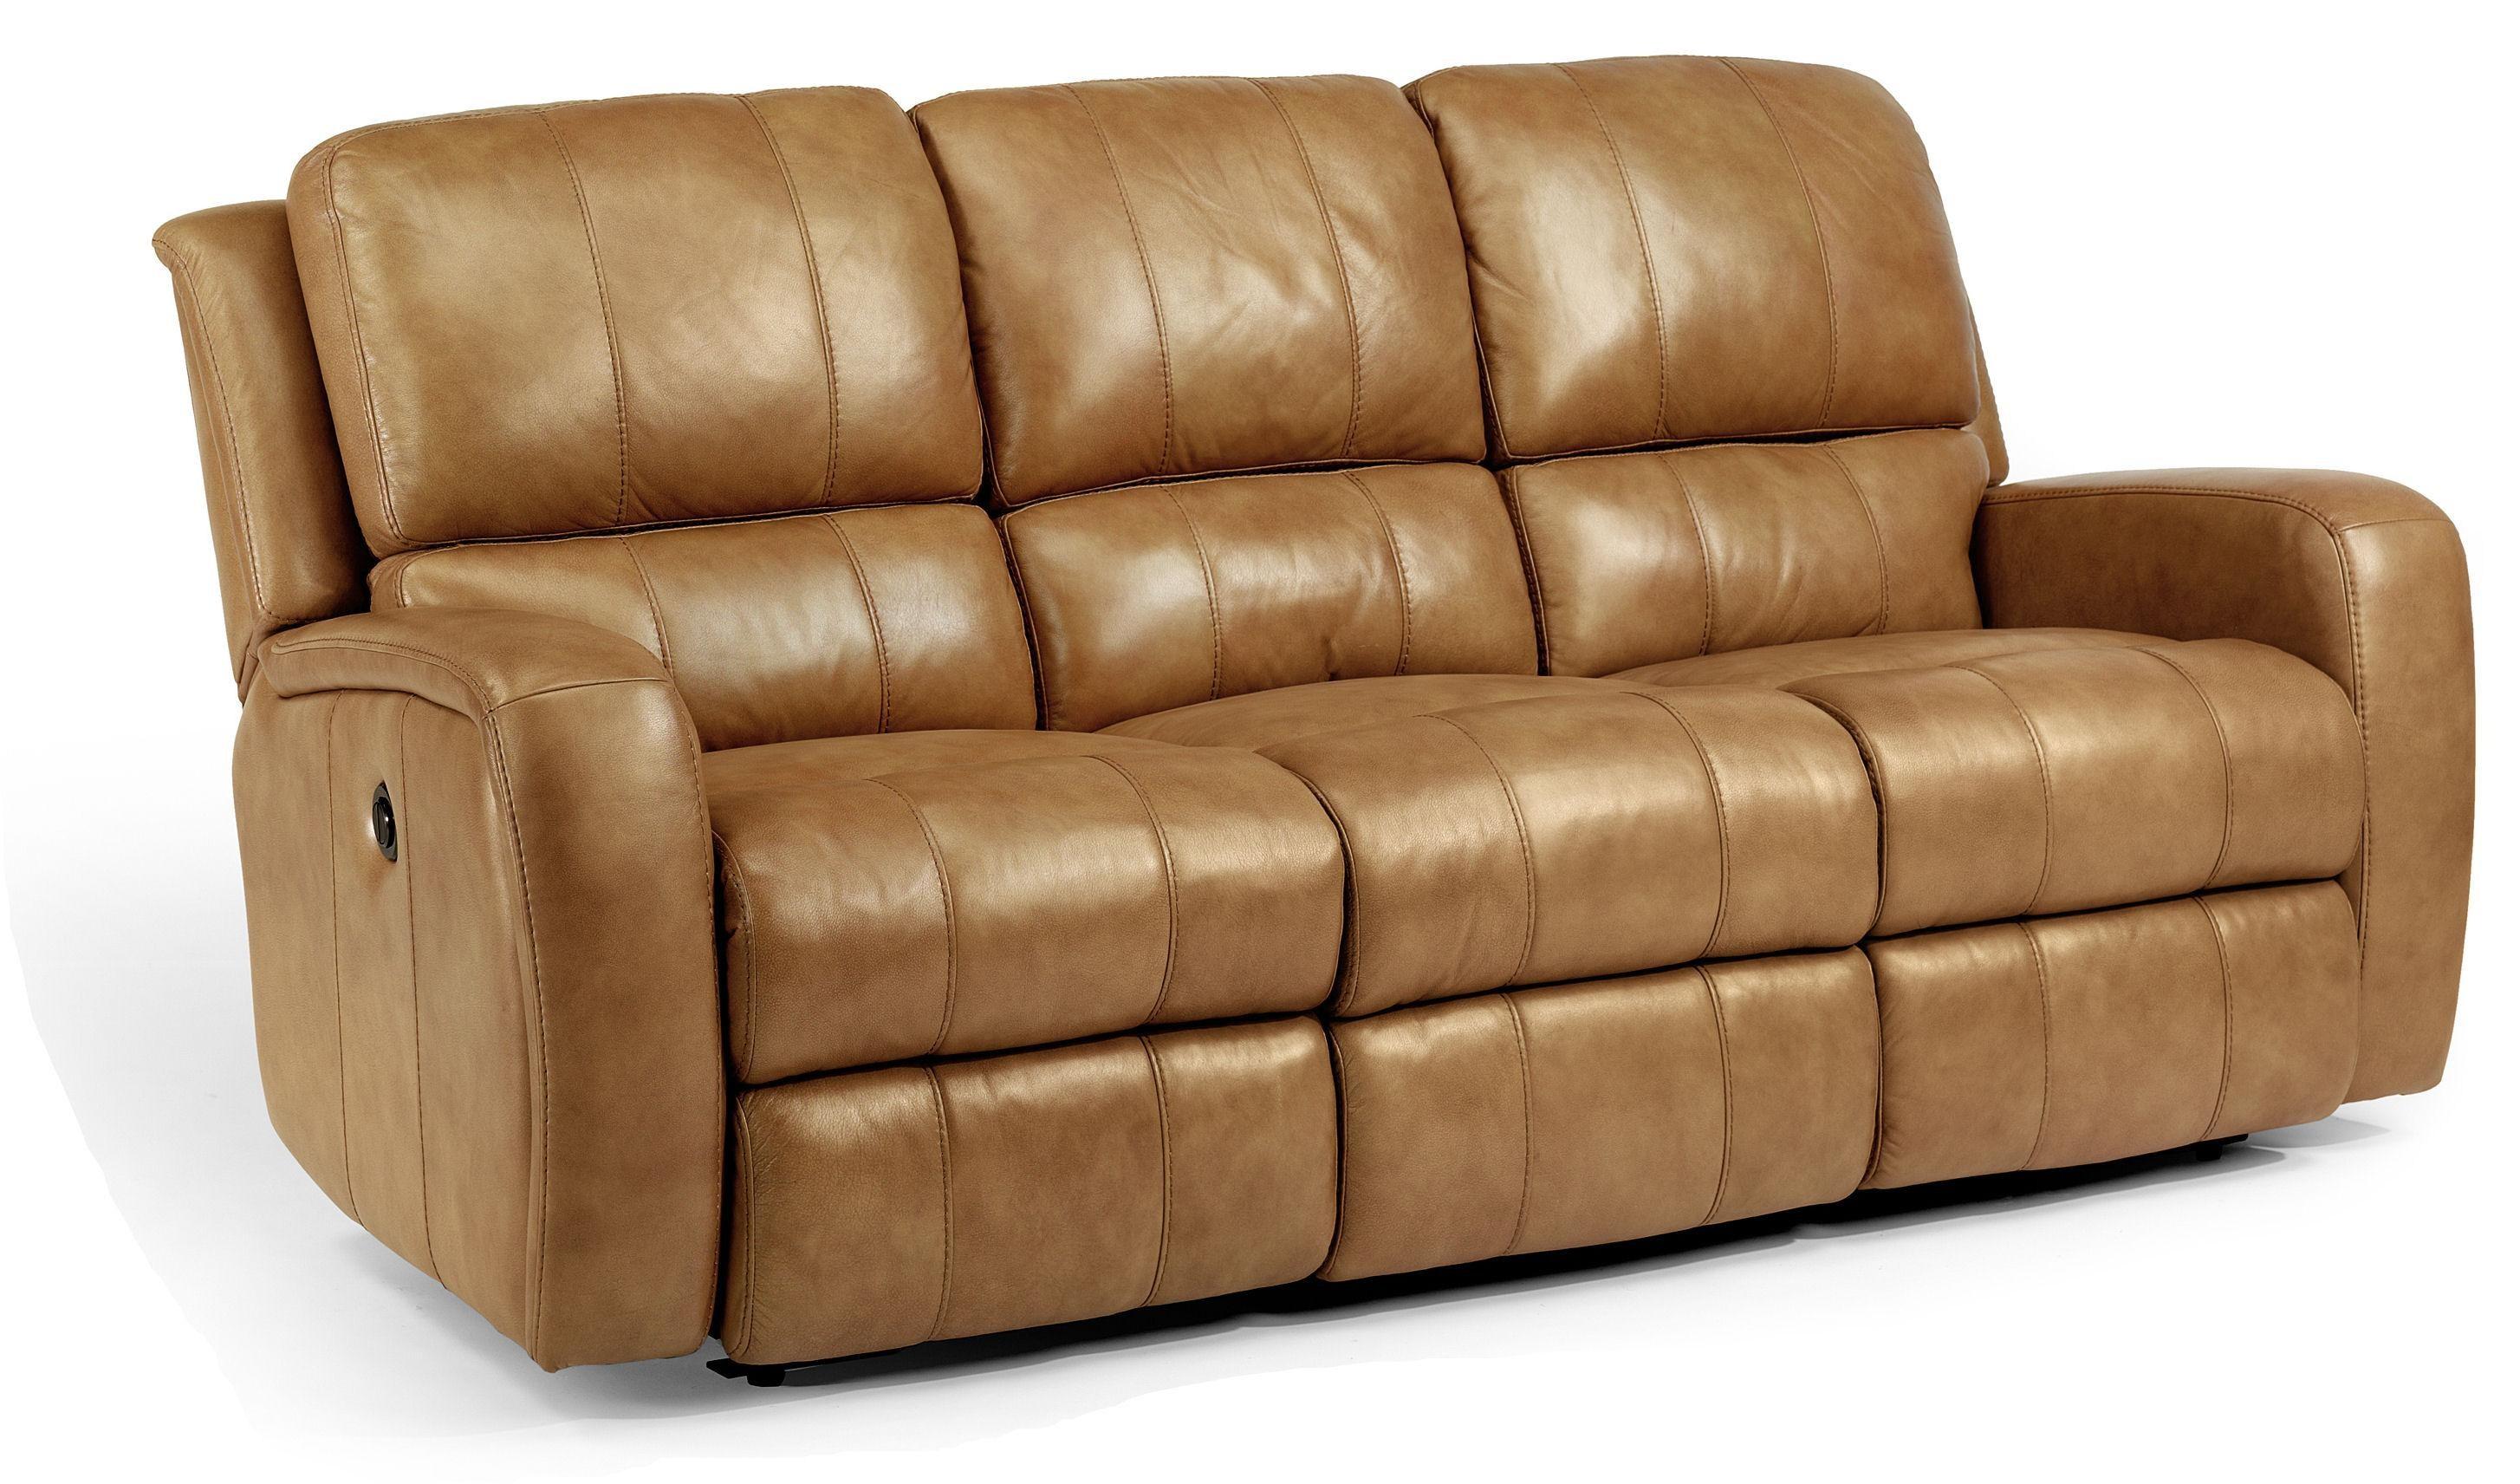 Flexsteel Latitudes-HammondDouble Reclining Sofa w/ Power